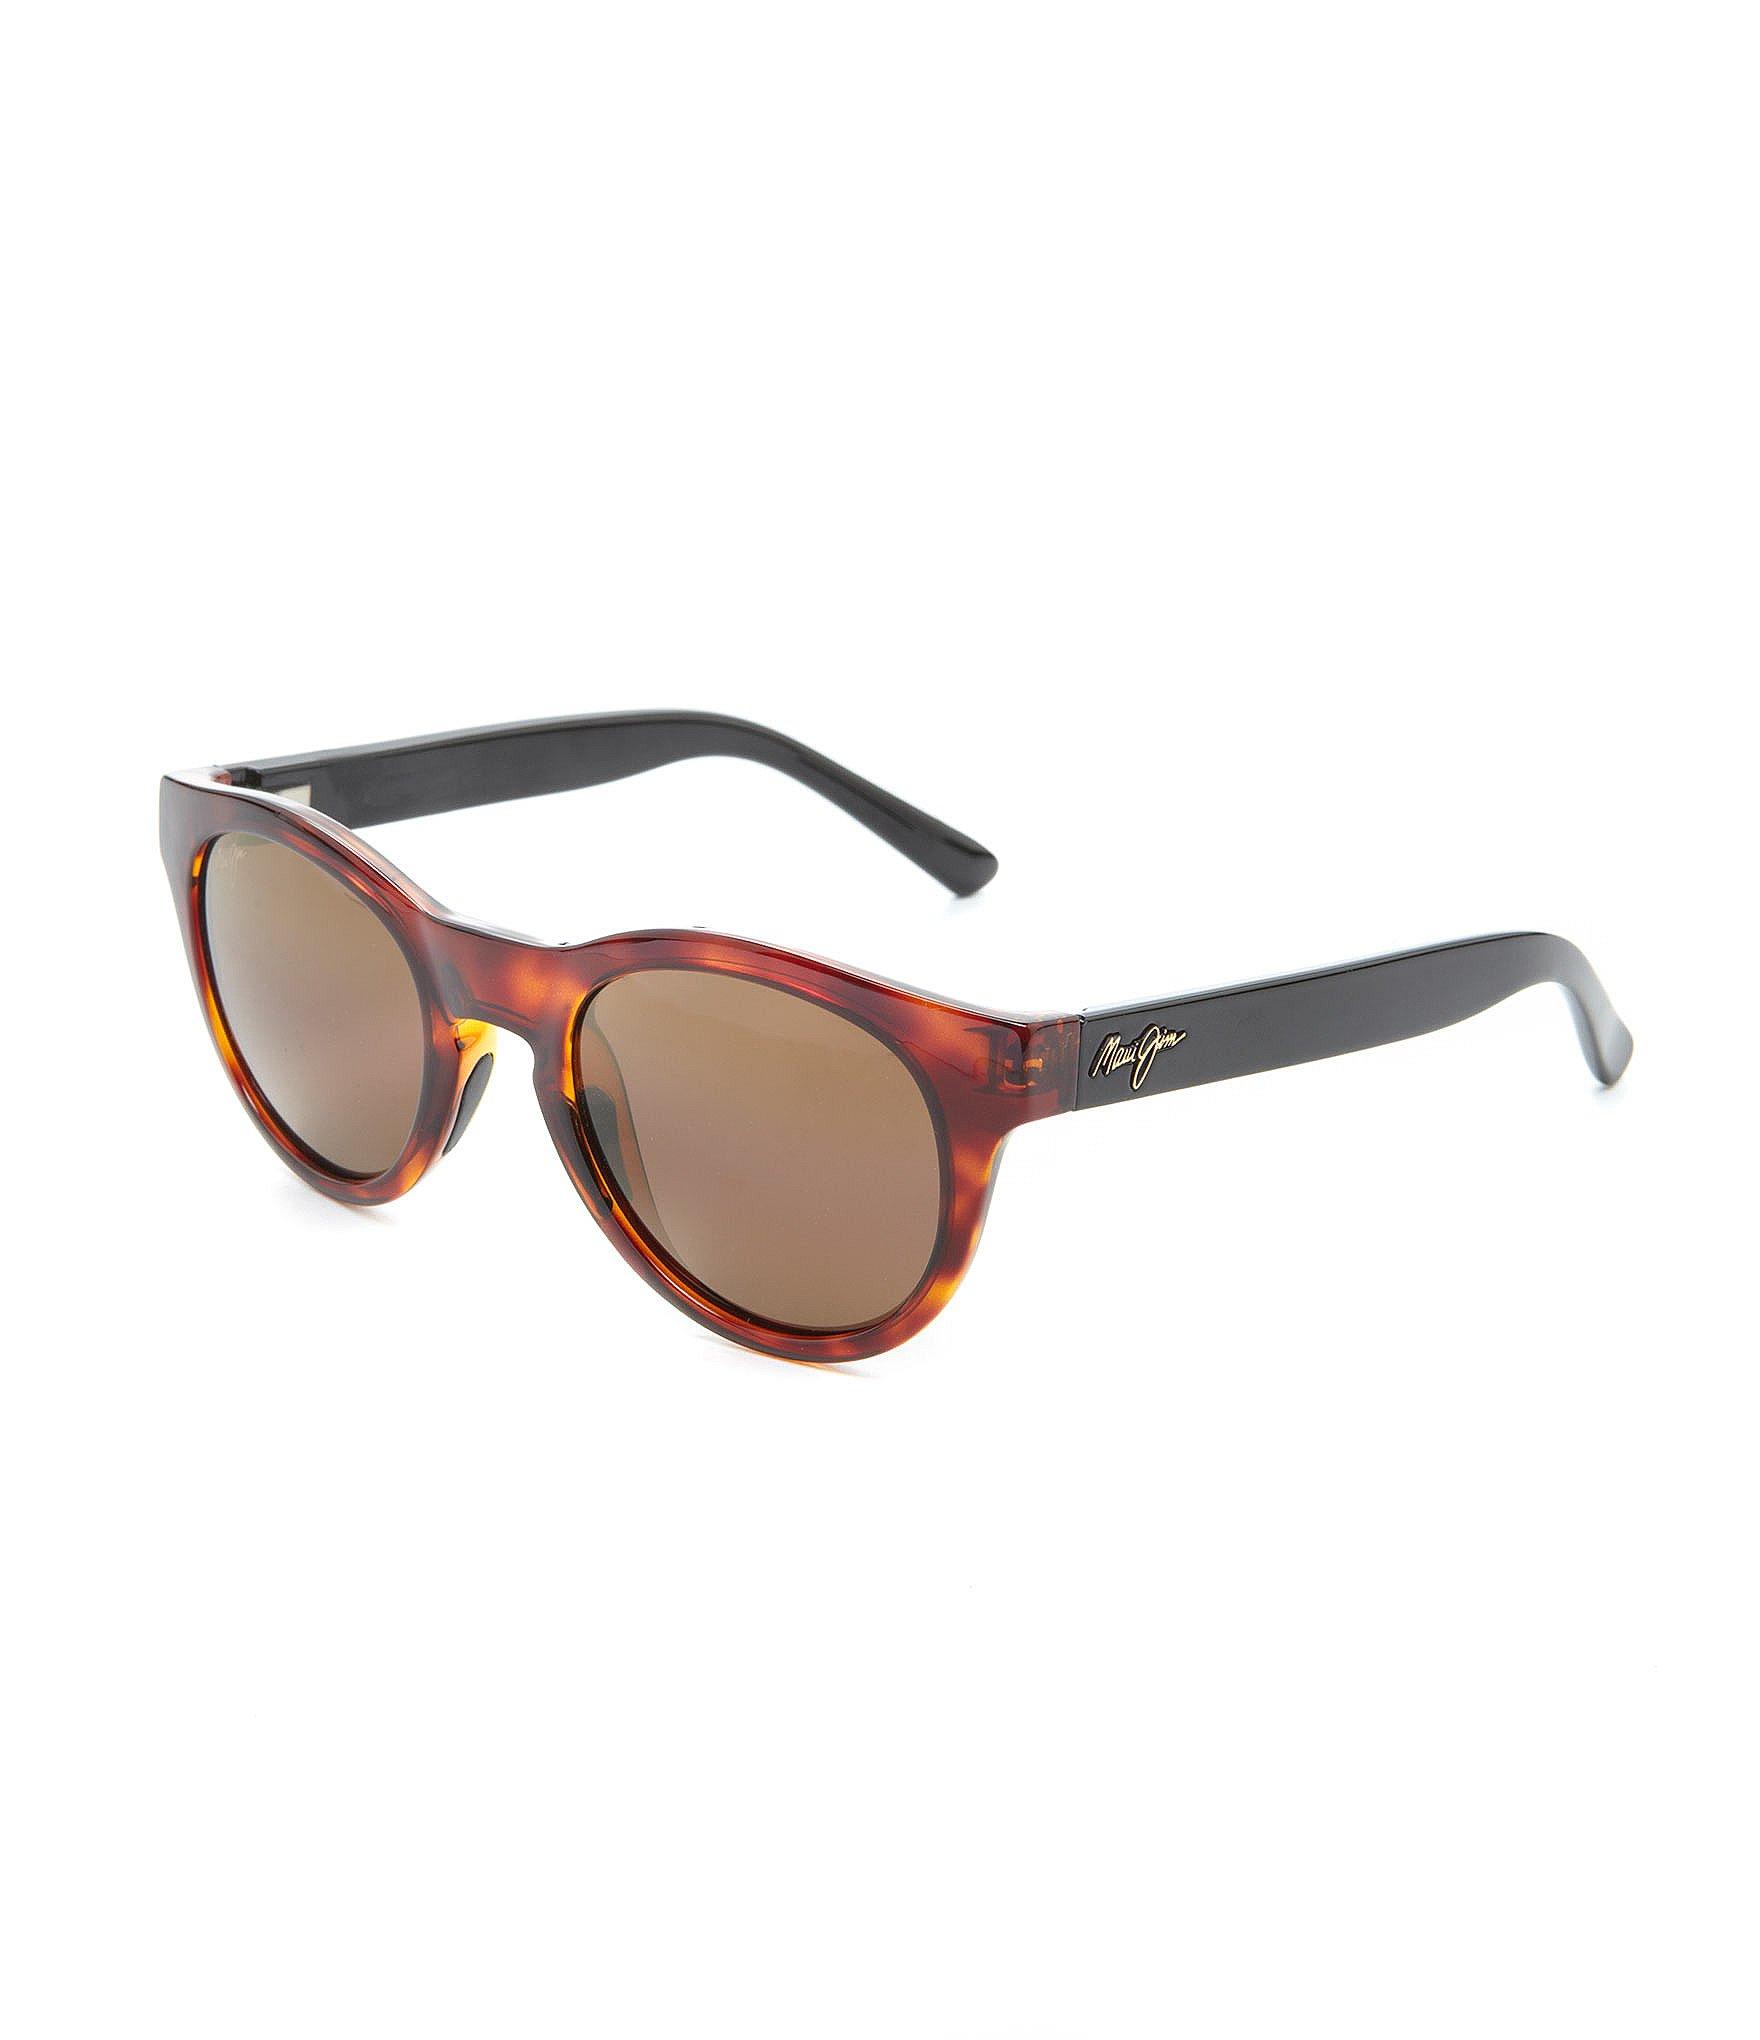 1760x2040 Accessories Sunglasses Amp Eyewear